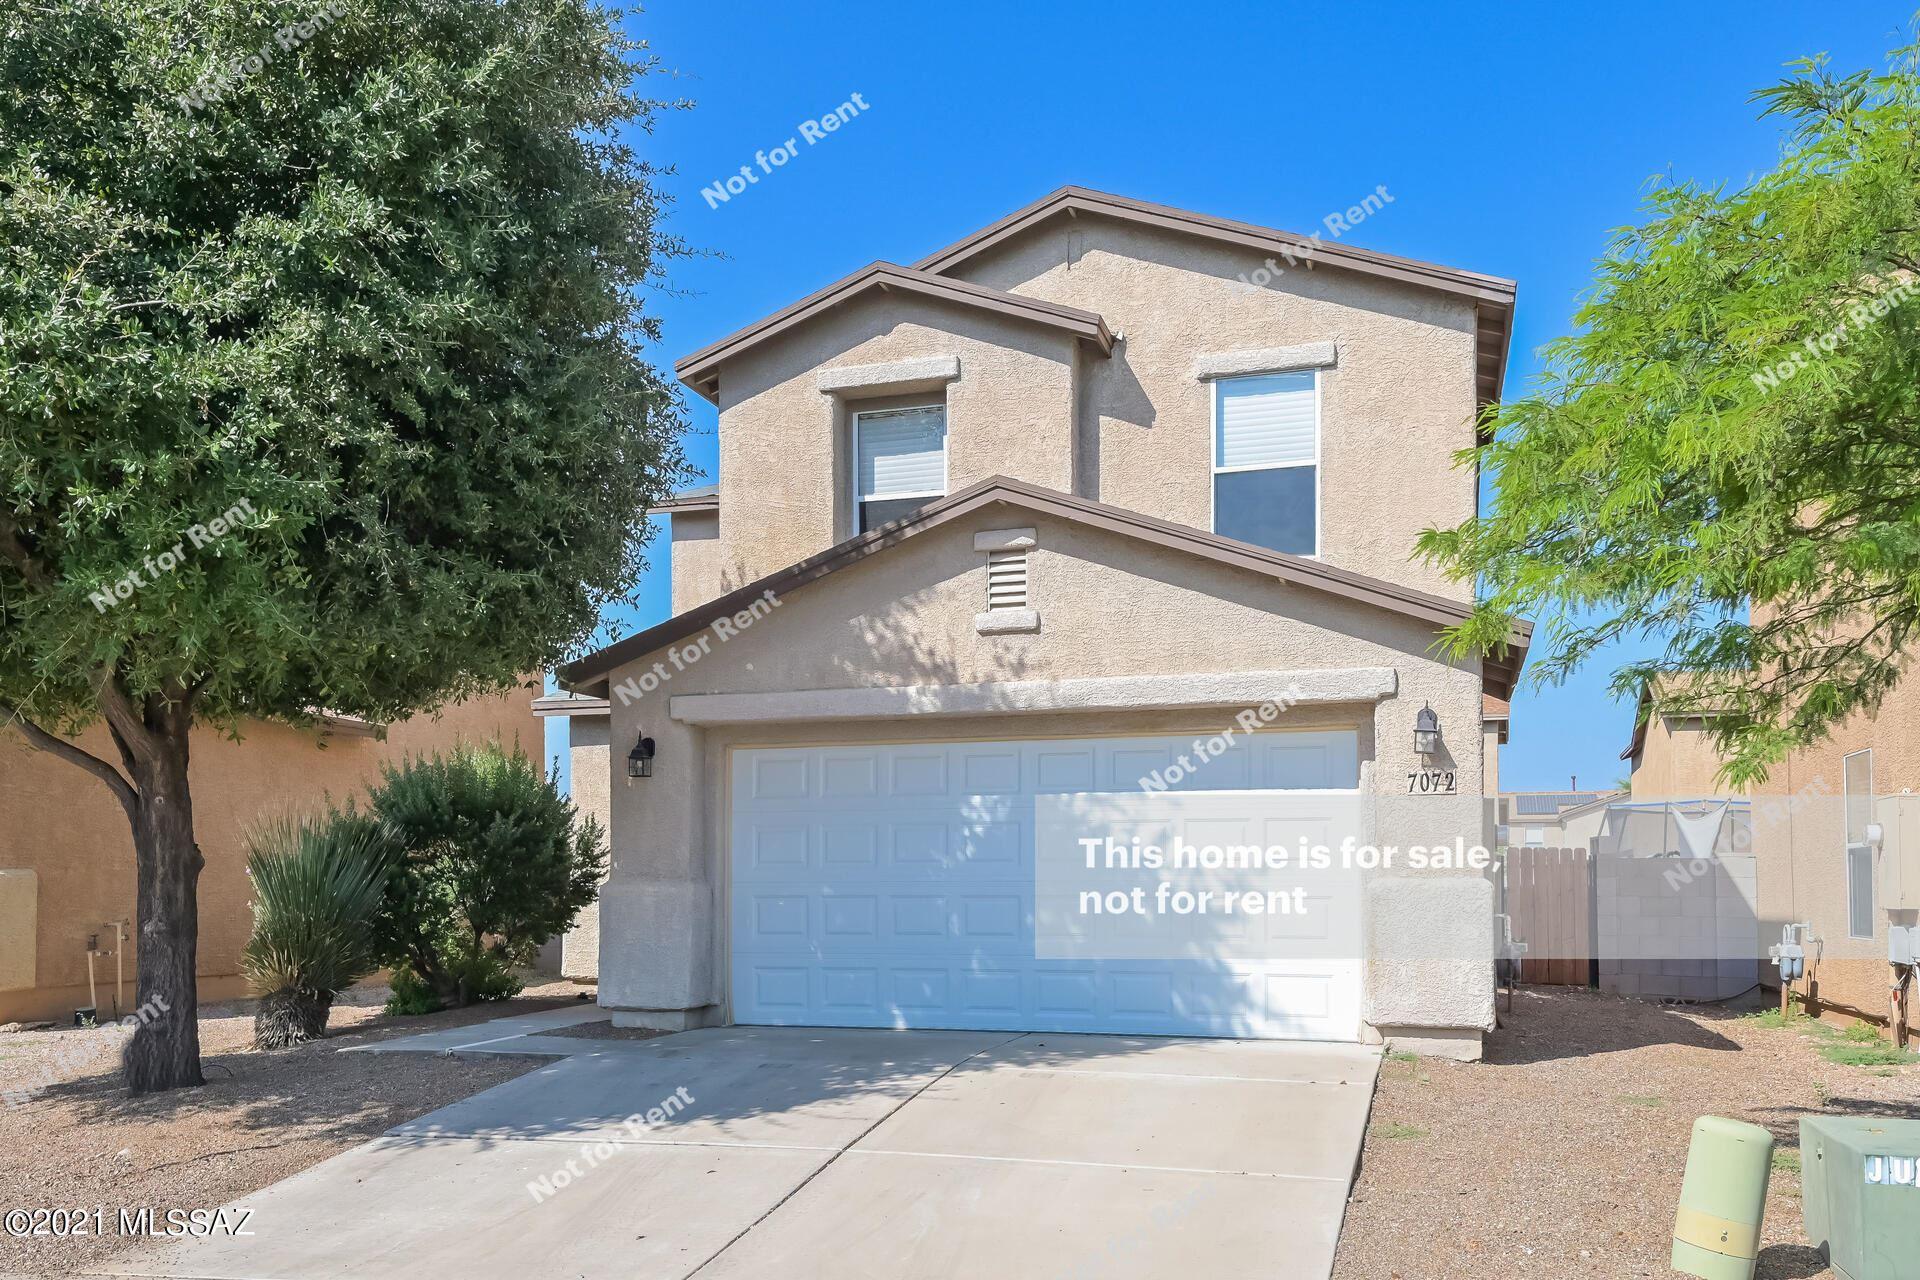 7072 S Dunnock Drive, Tucson, AZ 85756 - MLS#: 22123977